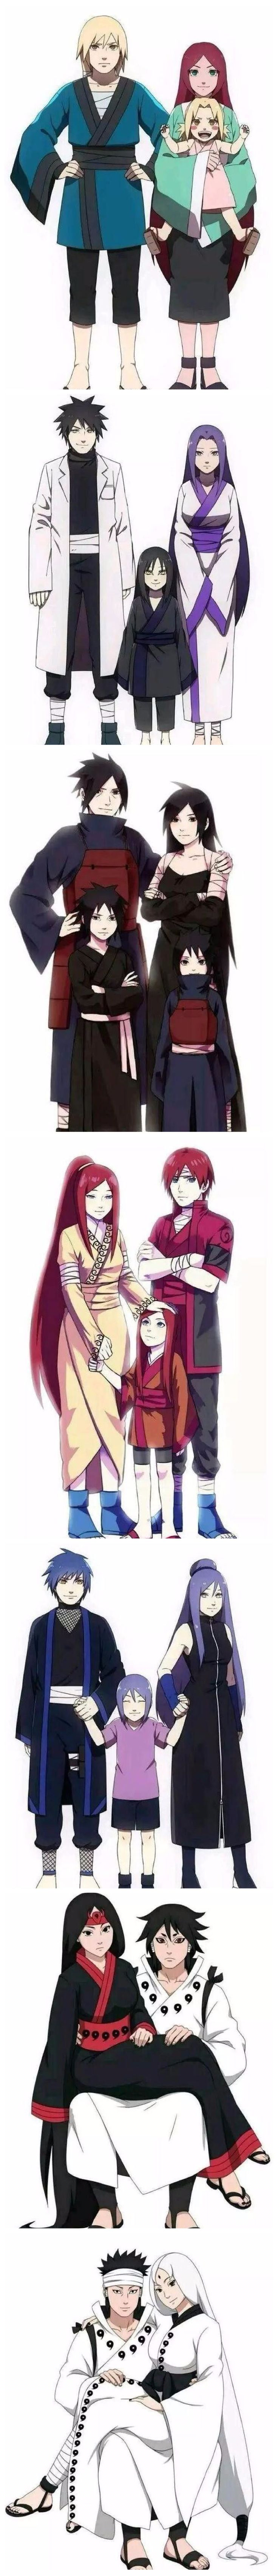 477 best animeka images on Pinterest